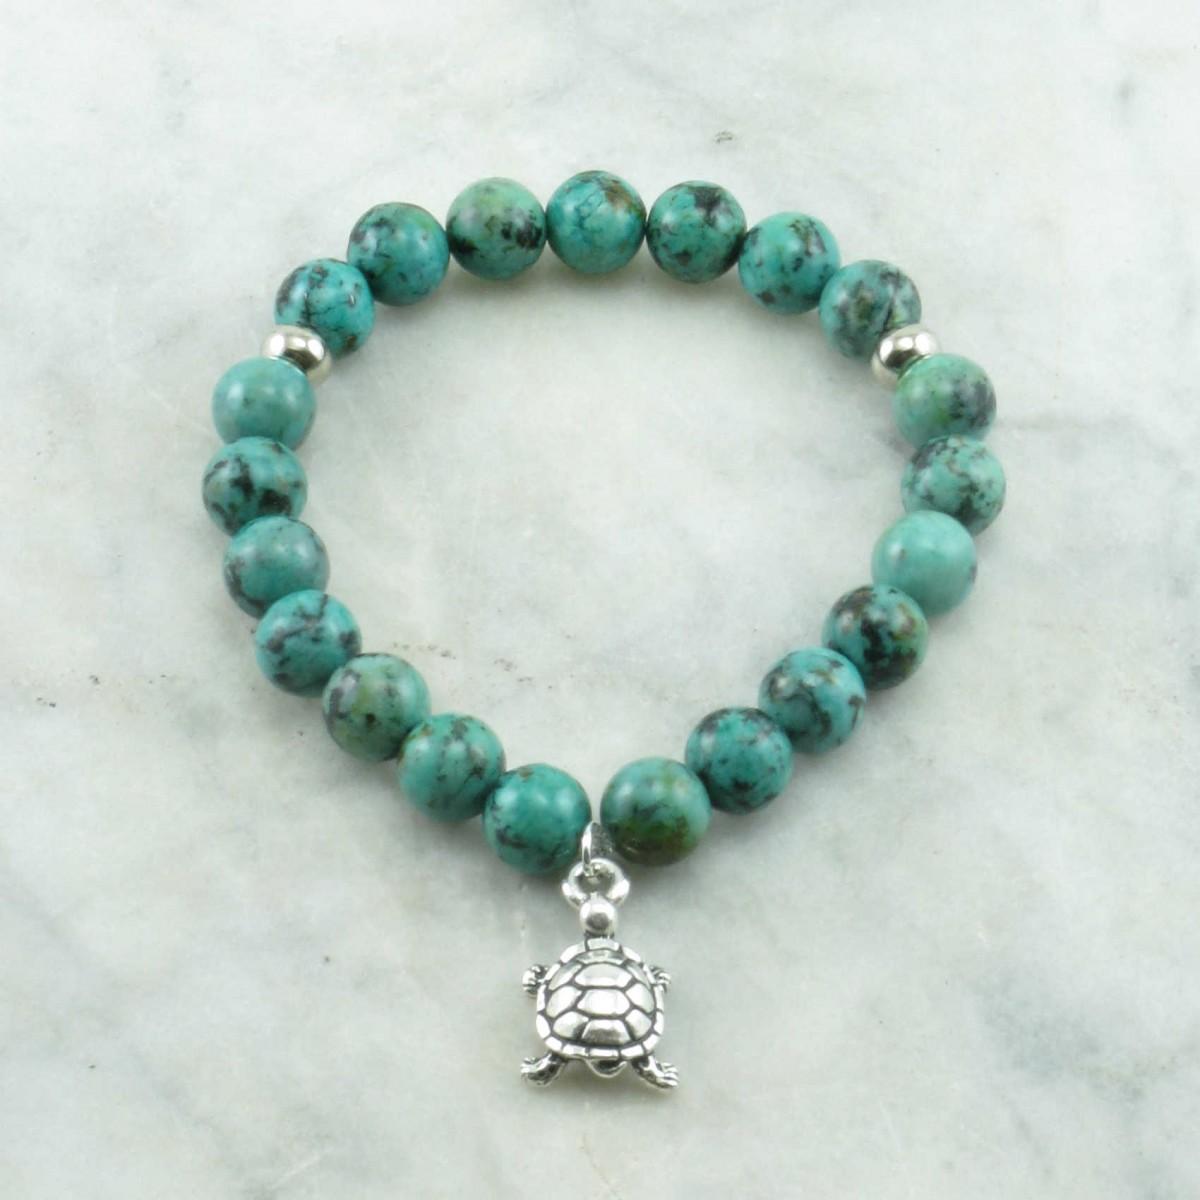 creation mala bead bracelet 21 turquoise mala beads. Black Bedroom Furniture Sets. Home Design Ideas